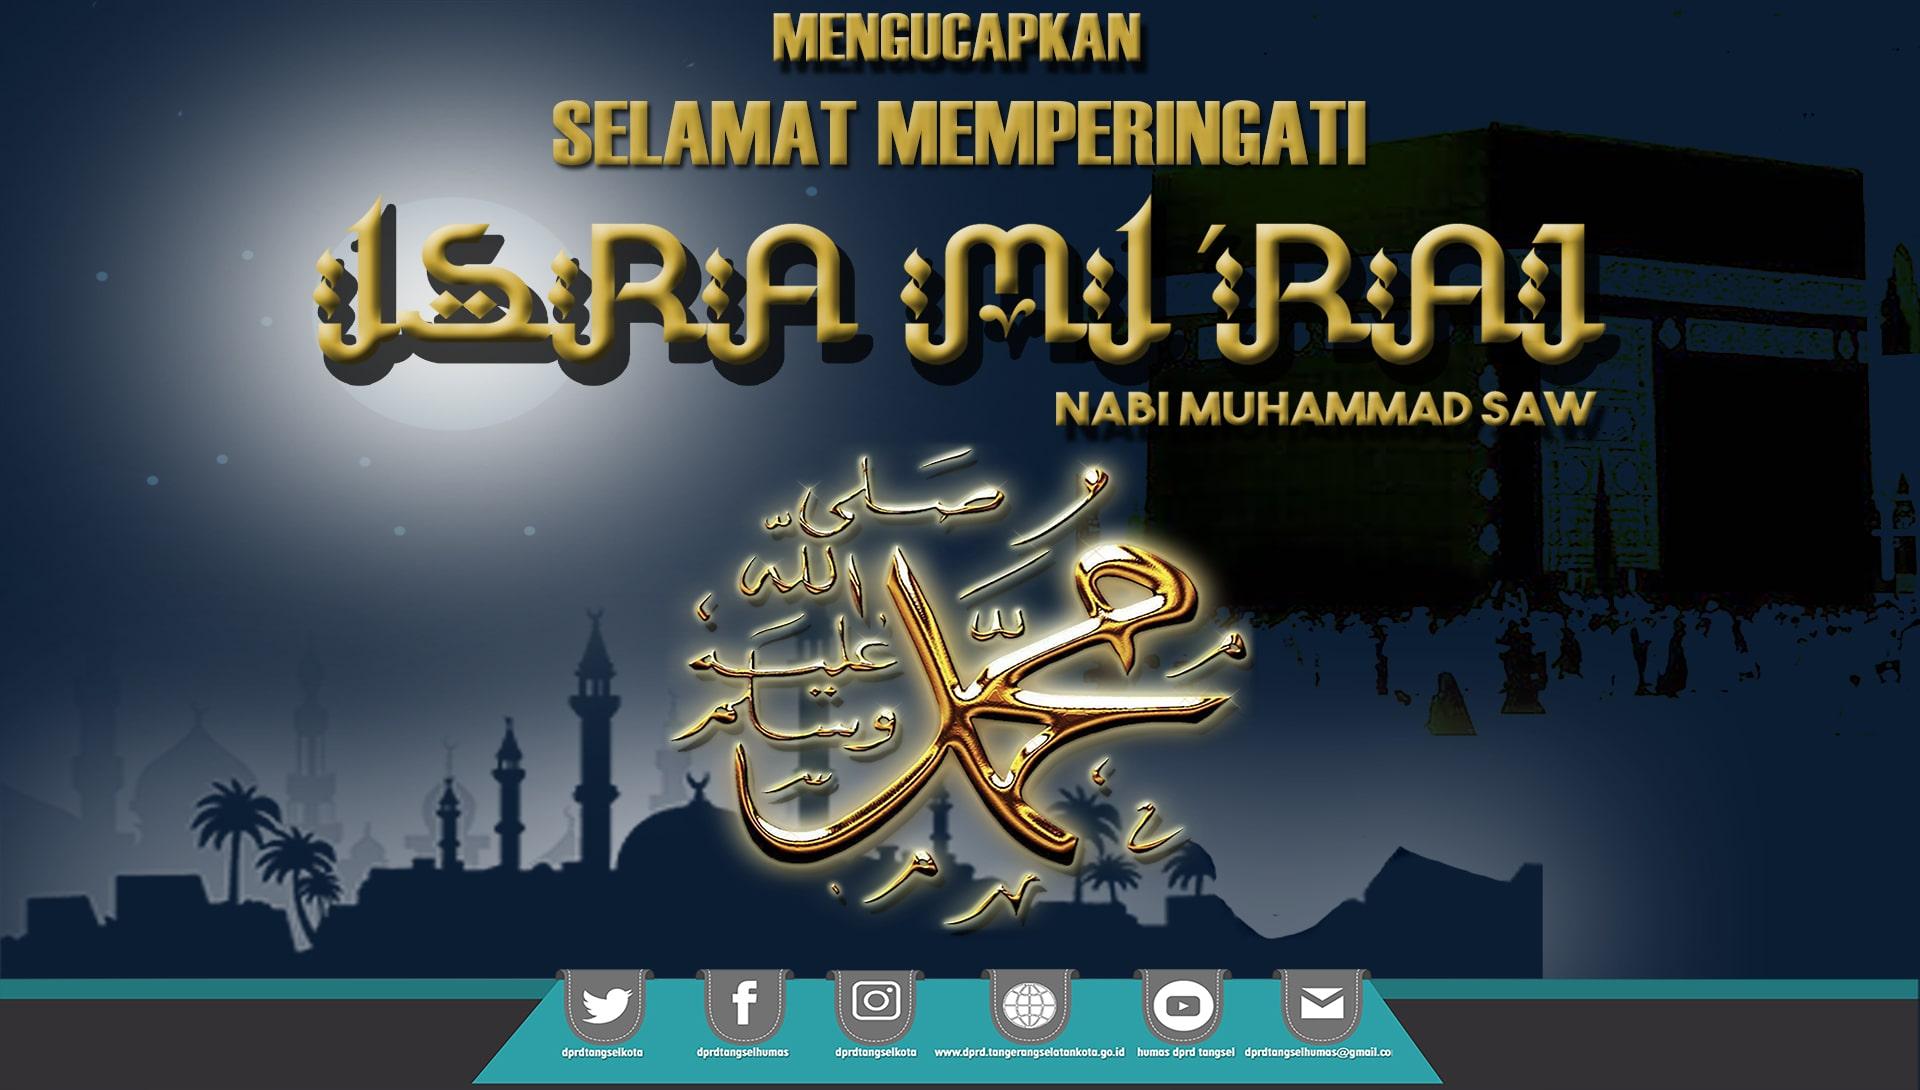 Selamat Memperingati Isra Miraj Nabi Muhamad SAW